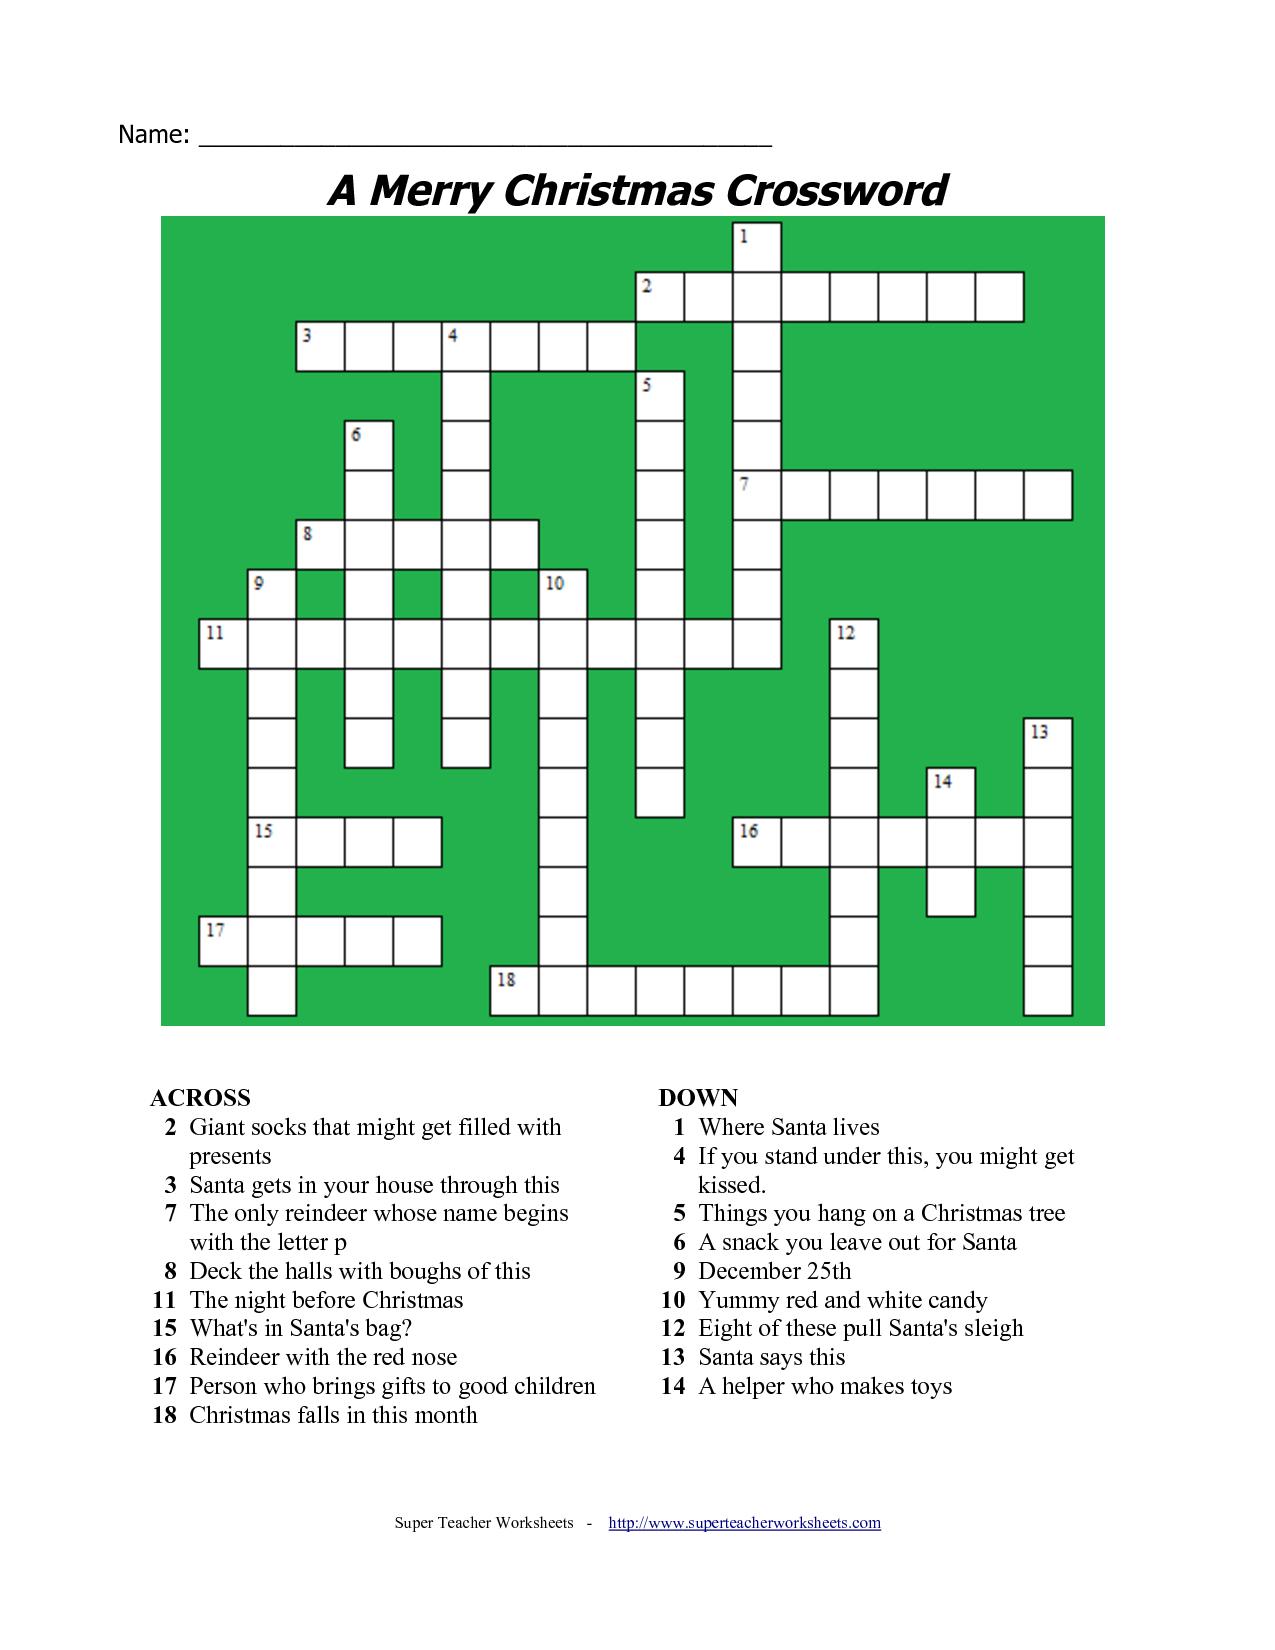 20 Fun Printable Christmas Crossword Puzzles | Kittybabylove - Christmas Printable Crossword Puzzles Adults